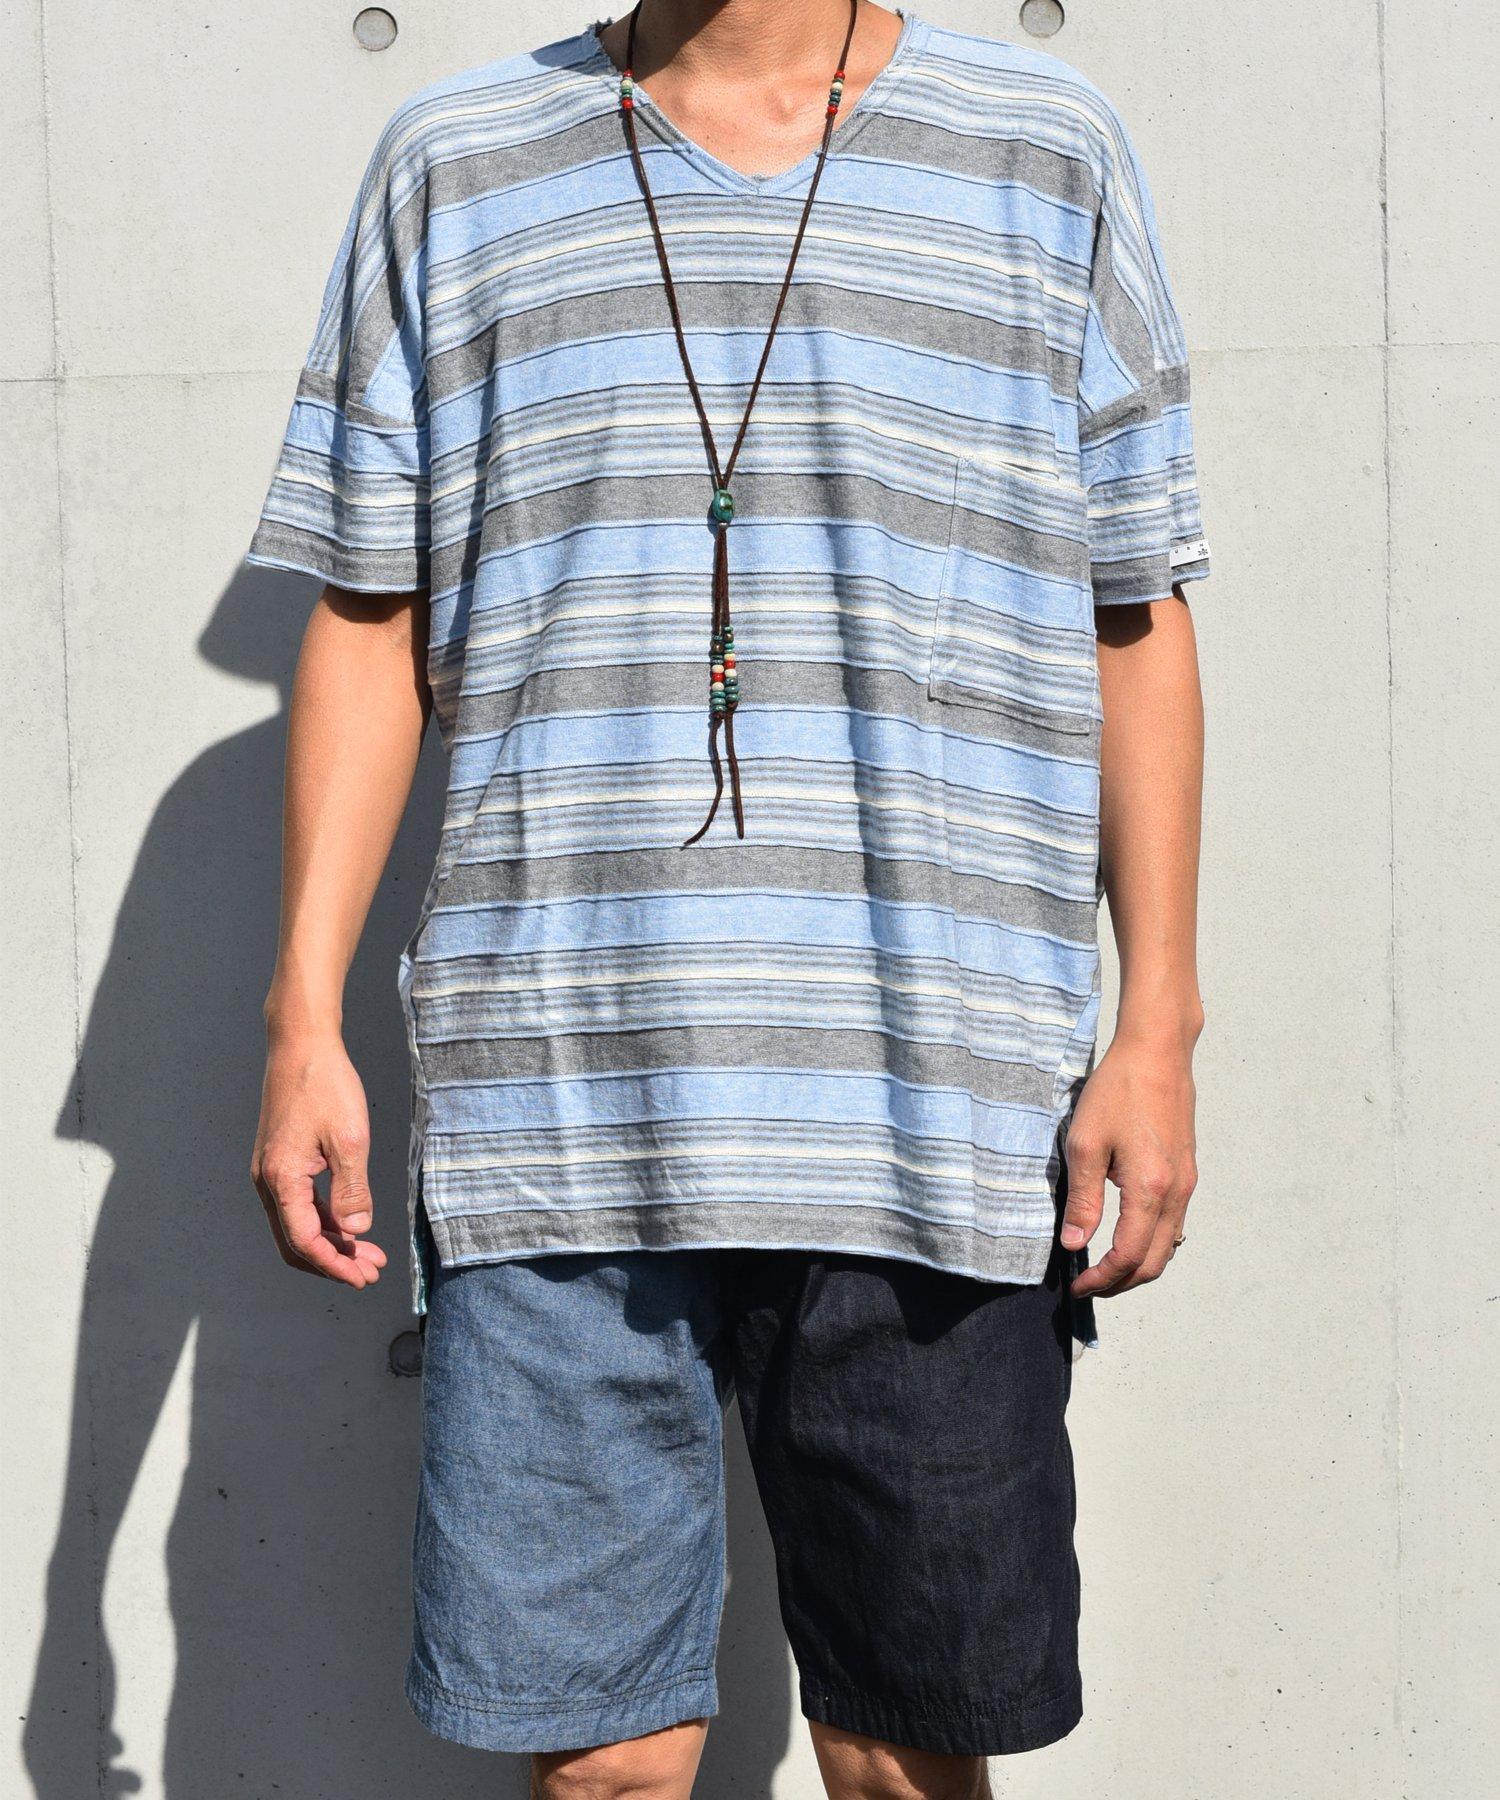 【SUMMER_CLEARANCE】Burnout〔バーンアウト〕 ビッグシルエットダウンショルダーVネック T-Shirt(Border)